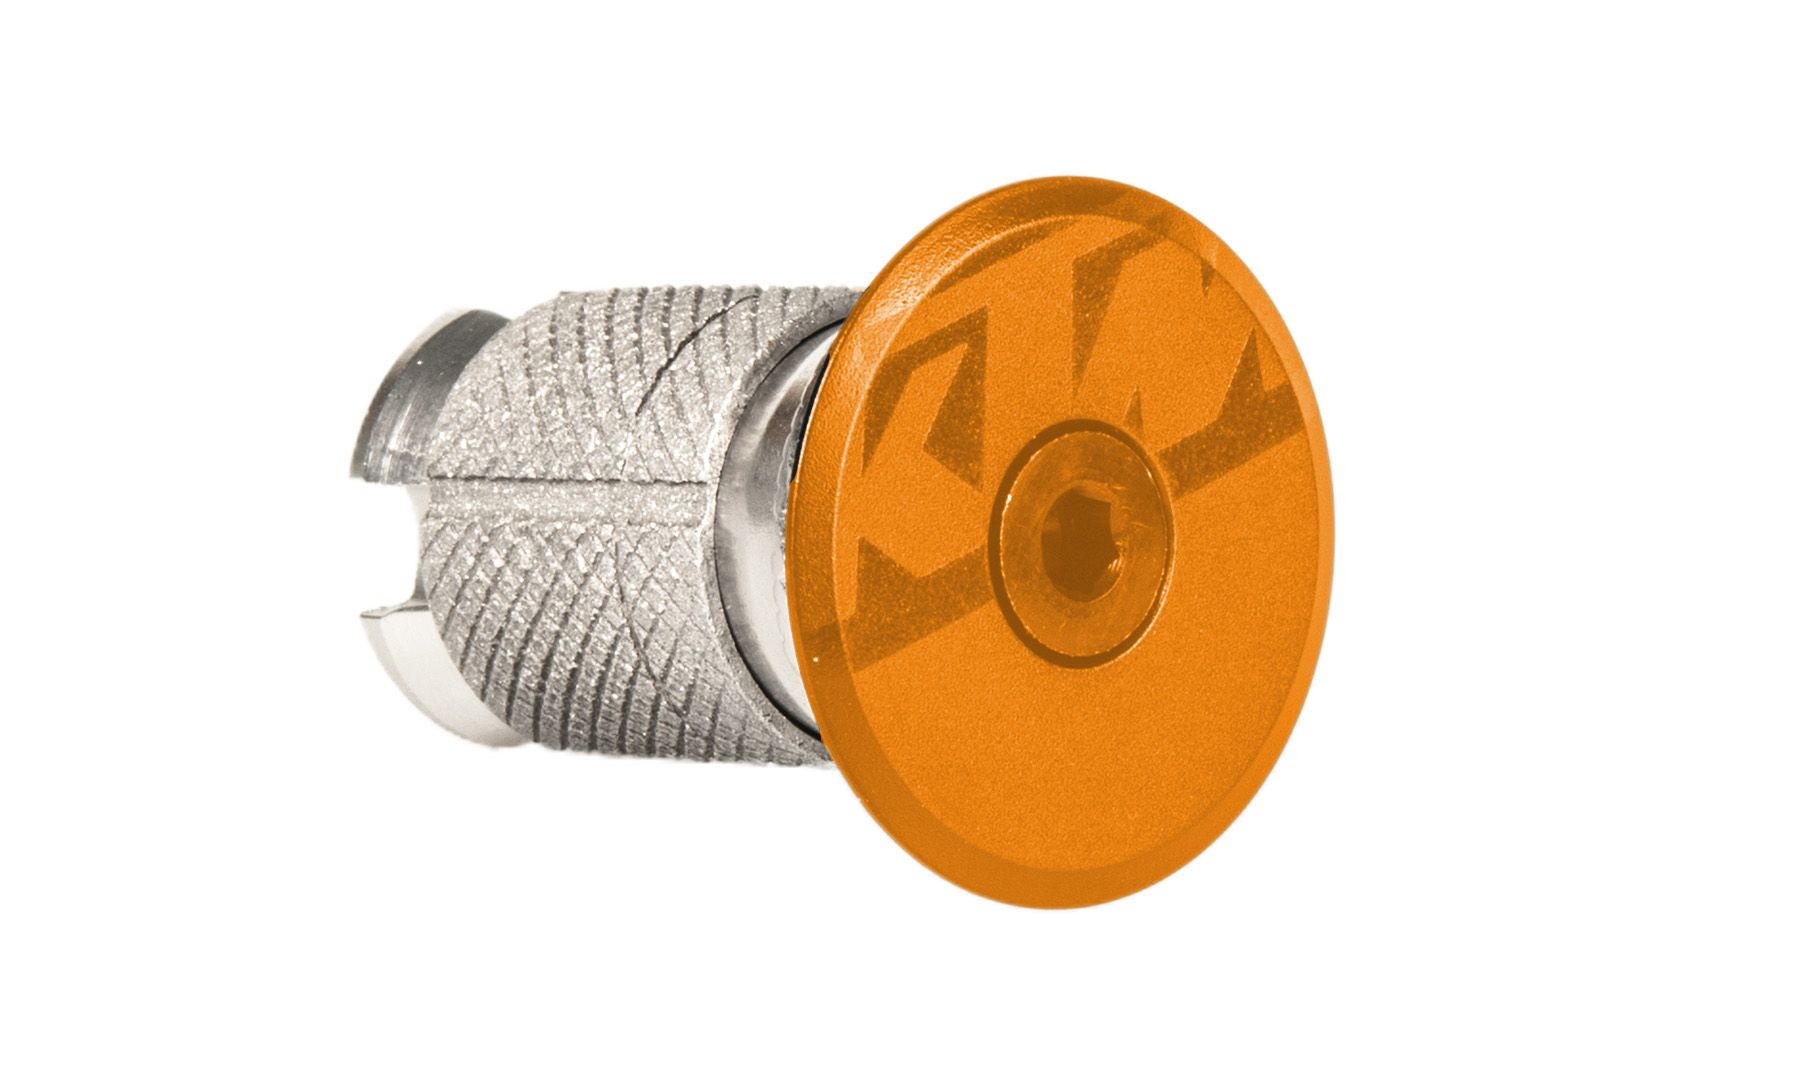 KTM Ahead System Prime II V alloy schwarz / orange